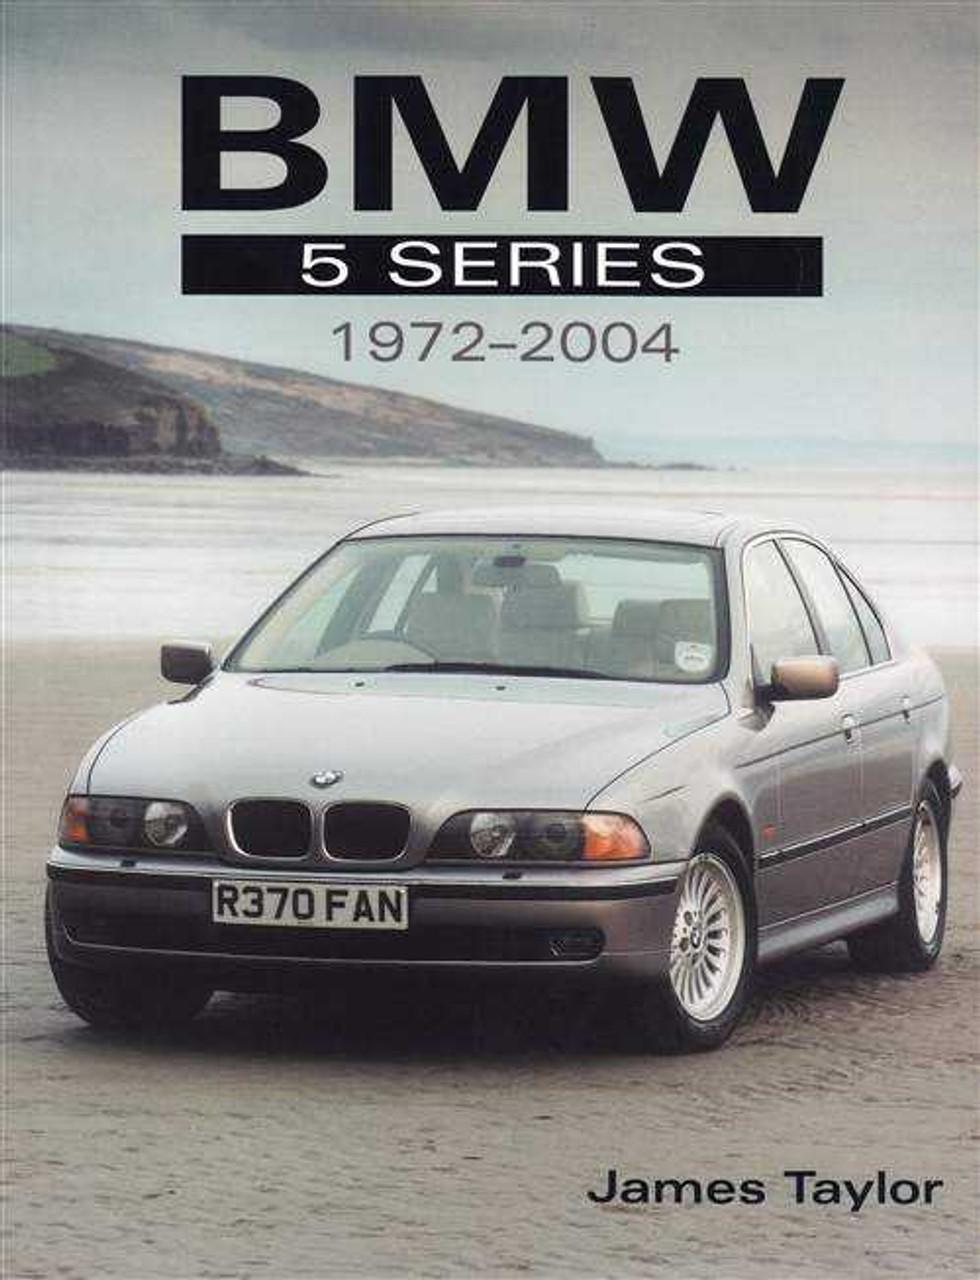 Bmw 5 Series 1972 2004